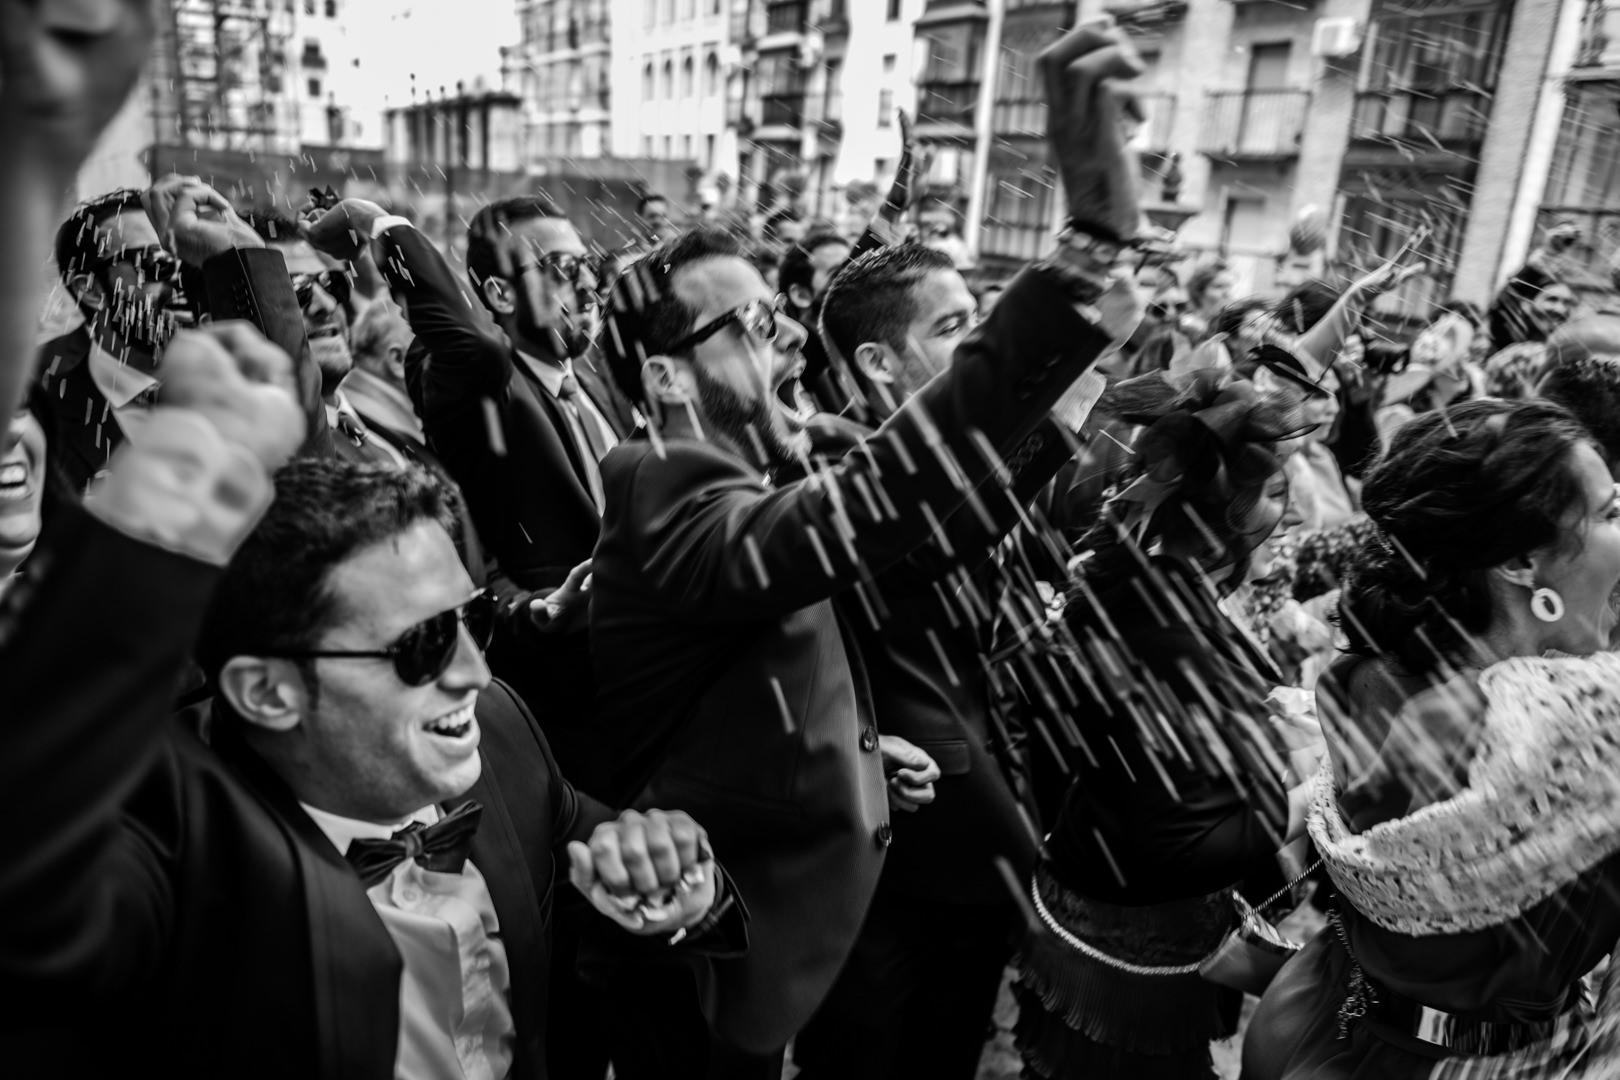 Boda-Catedral-Jaen-Hamburgo-Maria-David-engagement-Rafael-Torres-fotografo-bodas-sevilla-madrid-barcelona-wedding-photographer--27.jpg